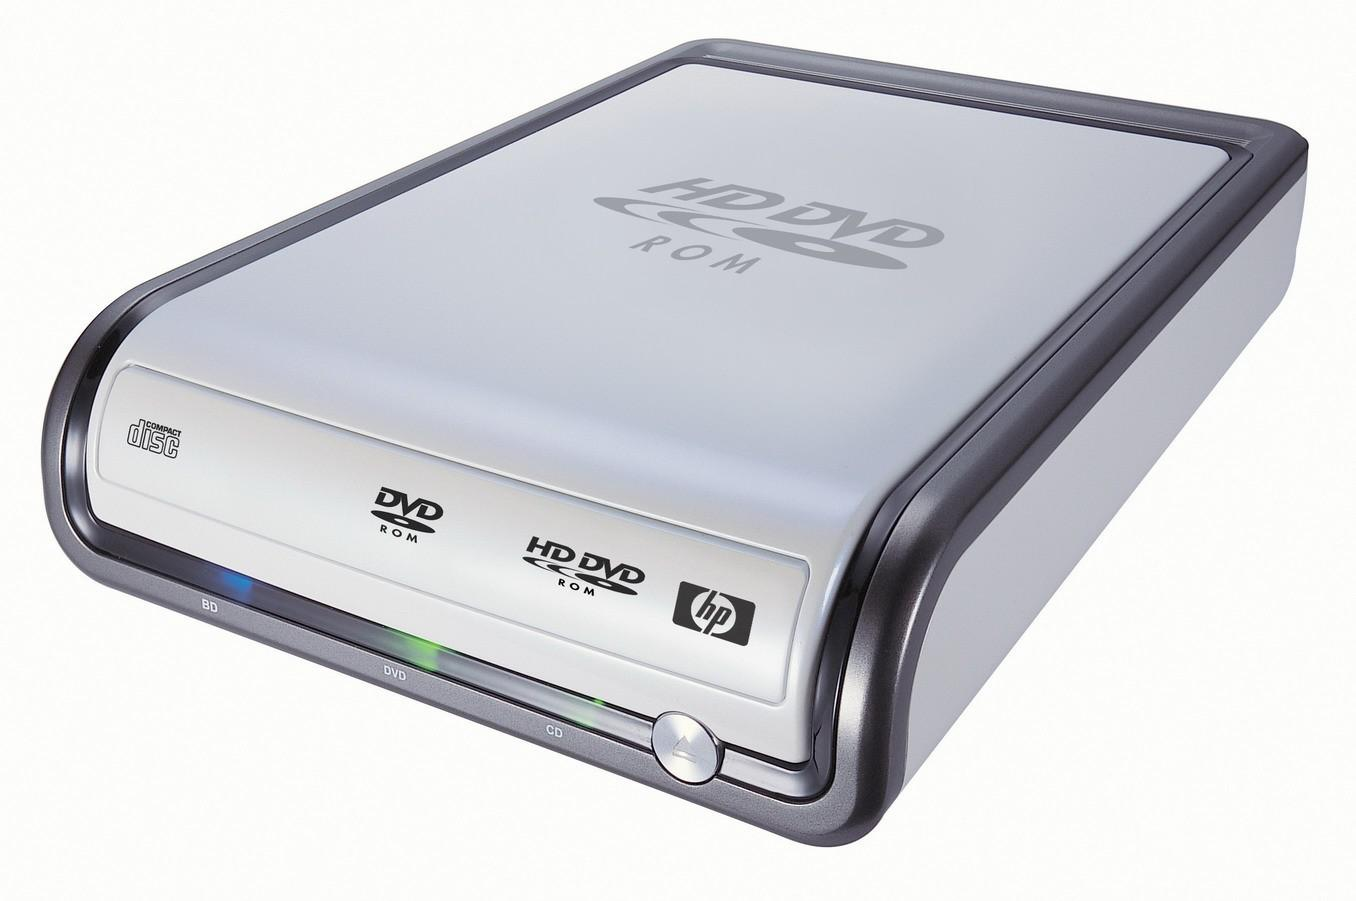 Dvd Rom Computer Hardware Blog